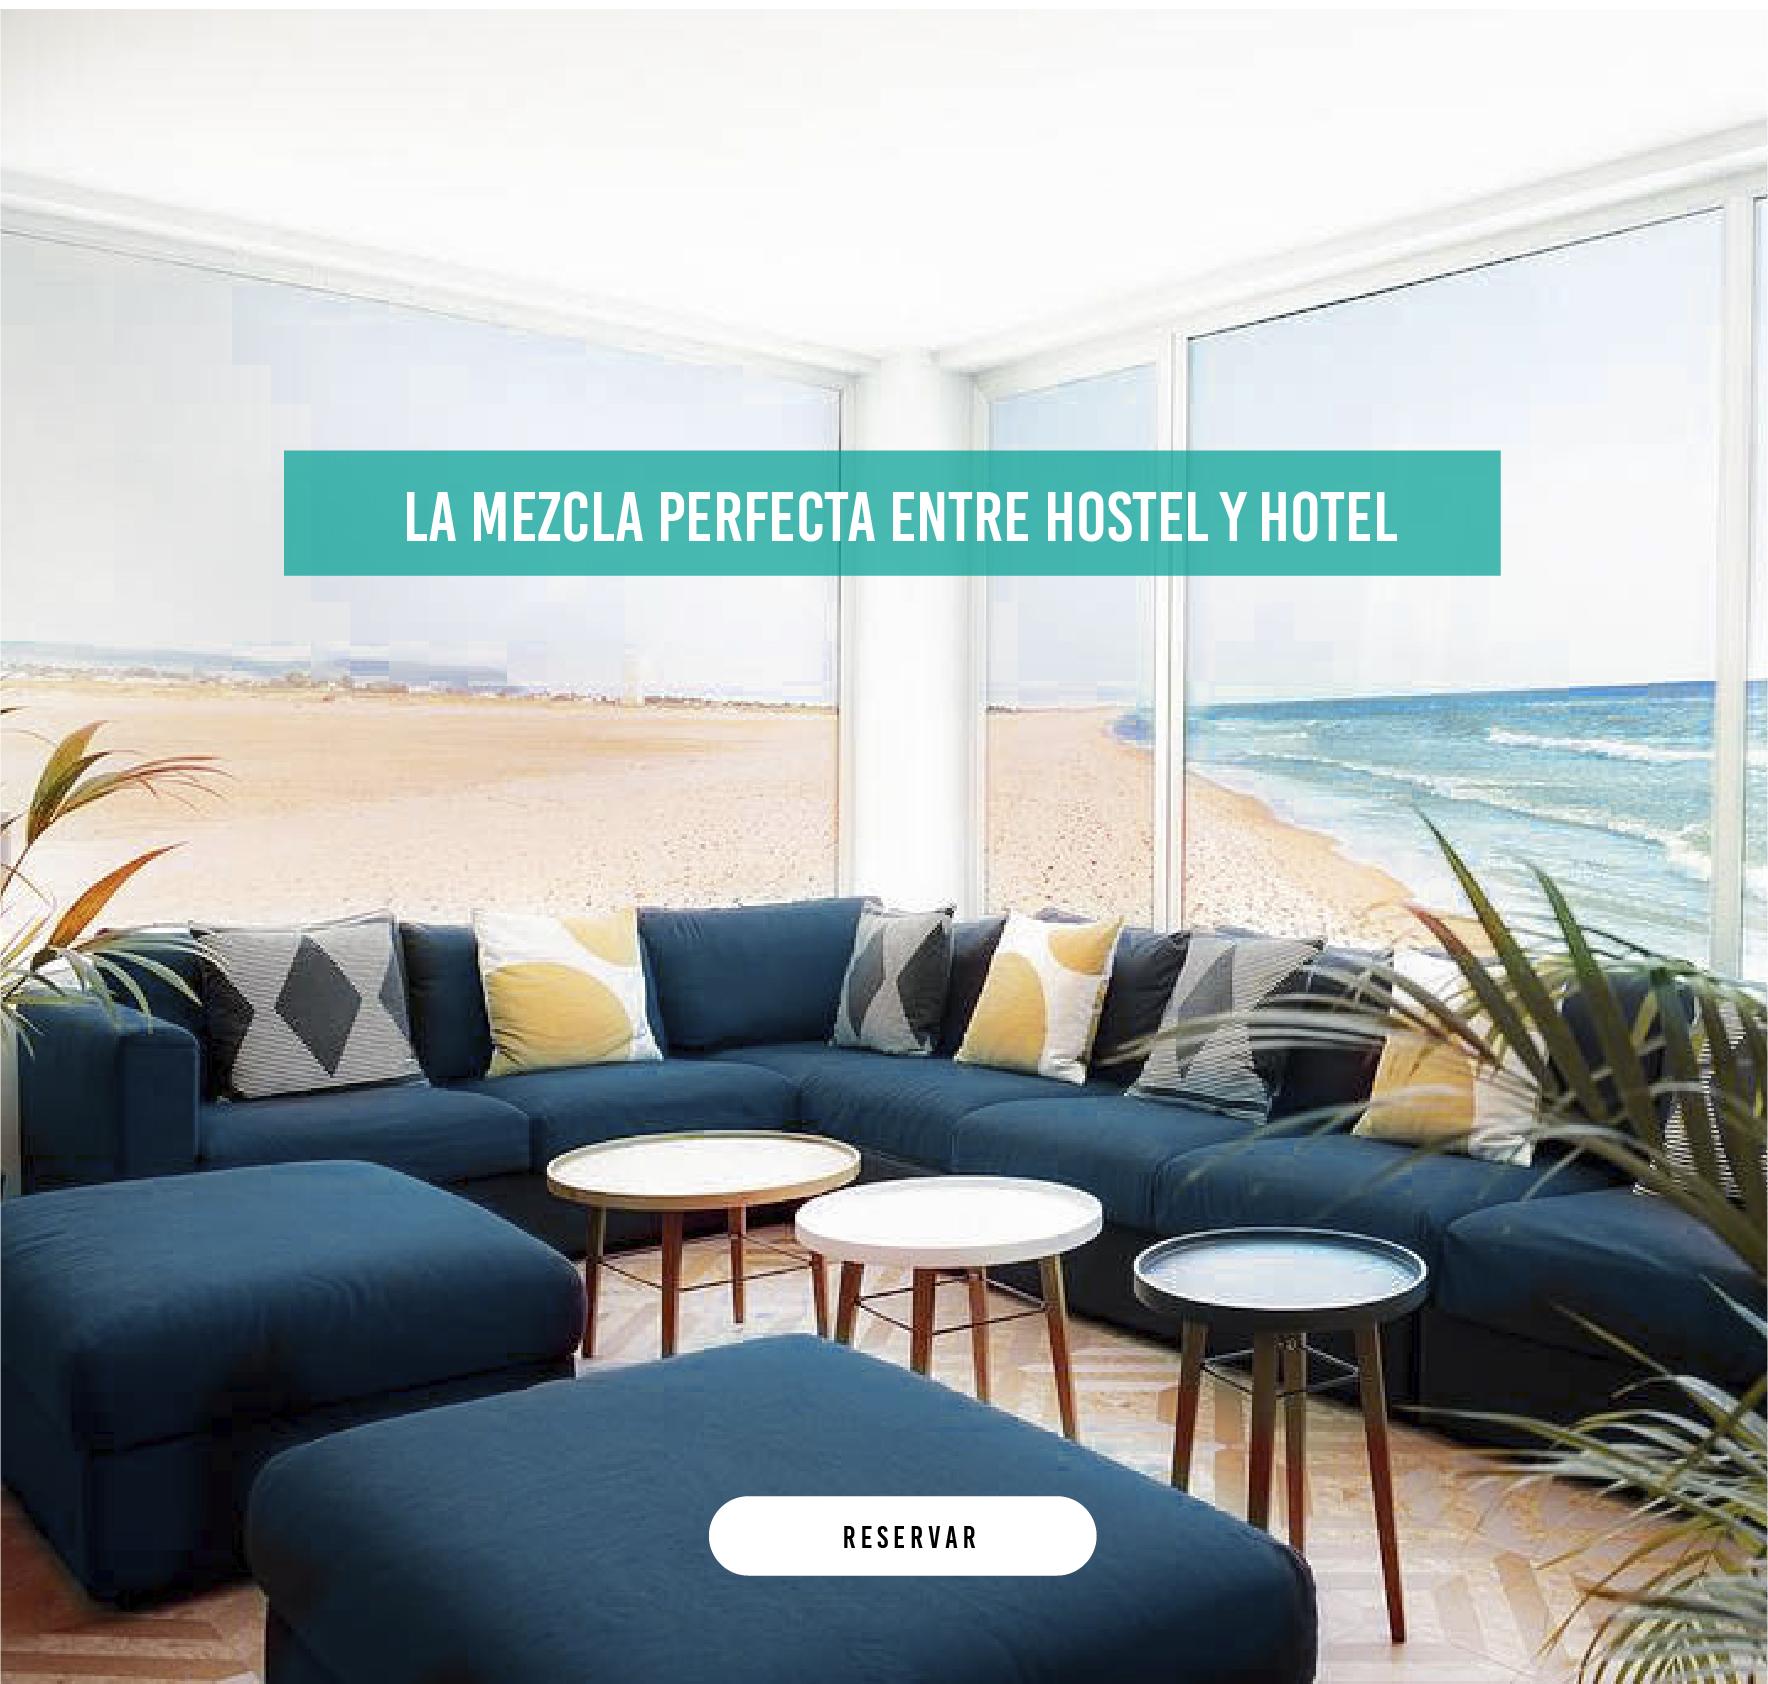 destacados home hostel_MOVIL-22